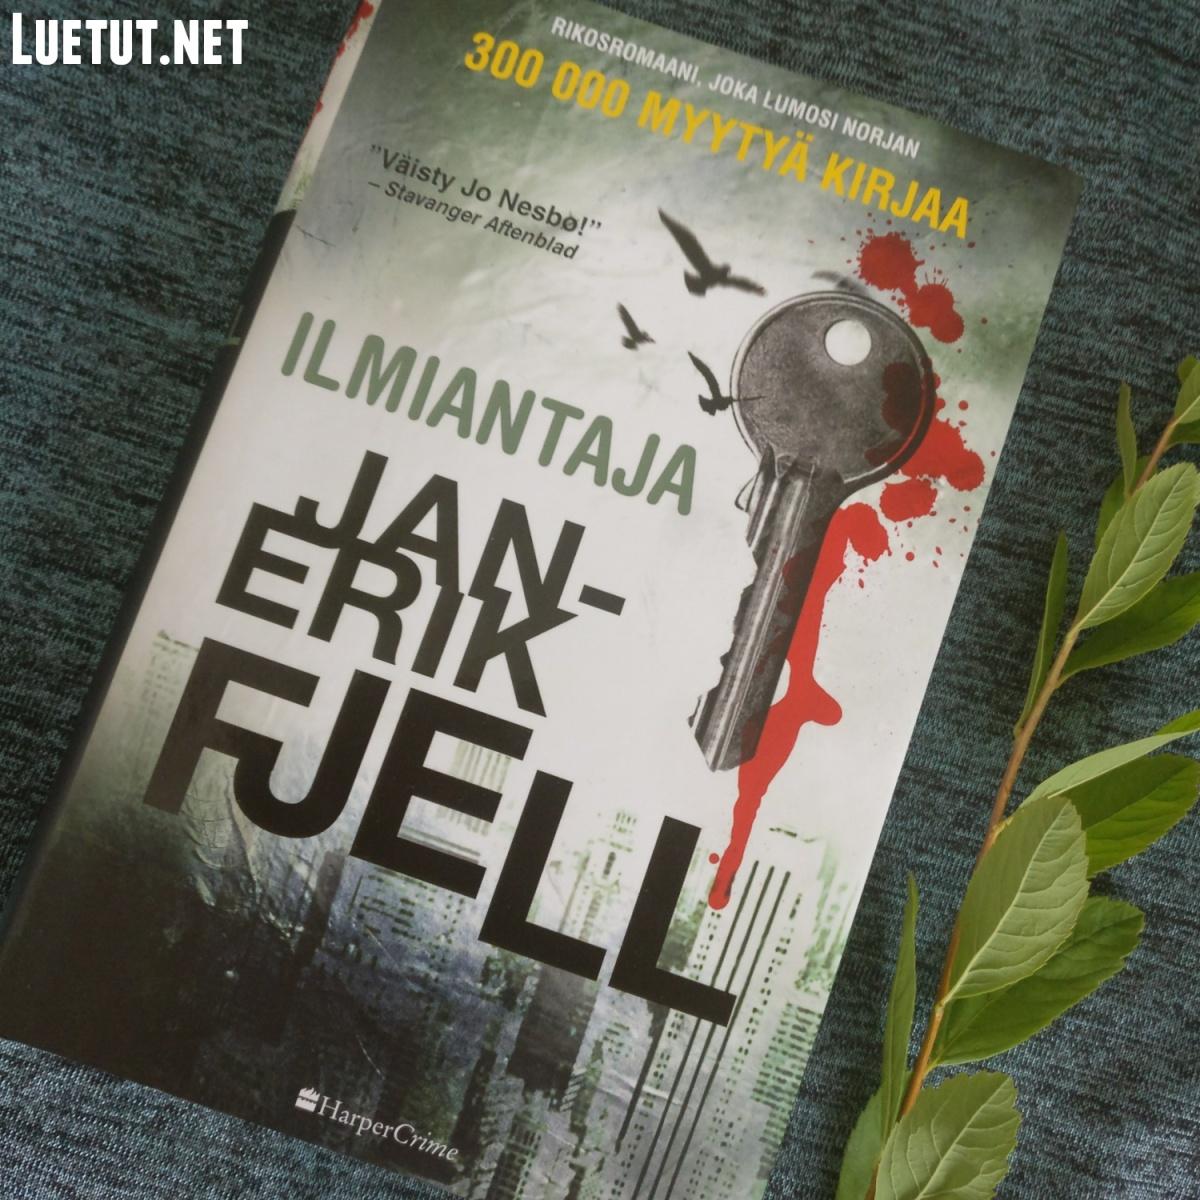 Jan-Erik Fjell: Ilmiantaja